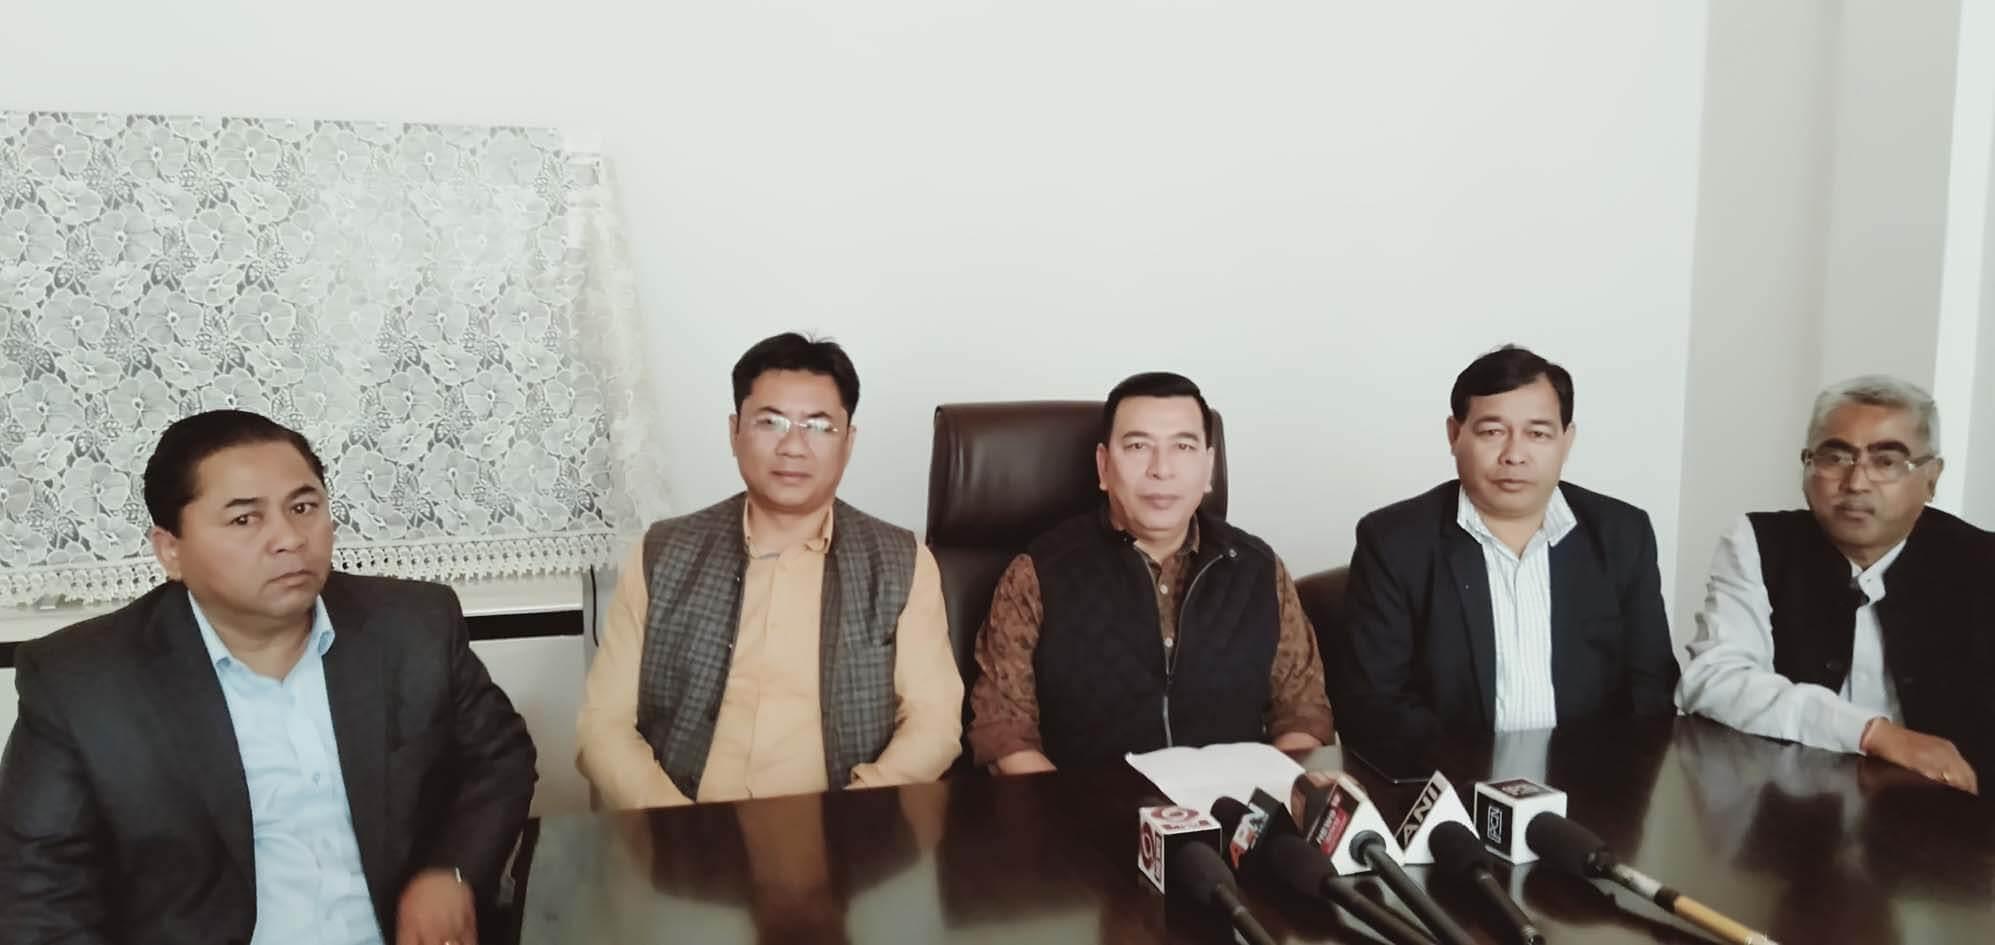 'Congress all geared up' says Congress spokesperson HM Shiangpliang